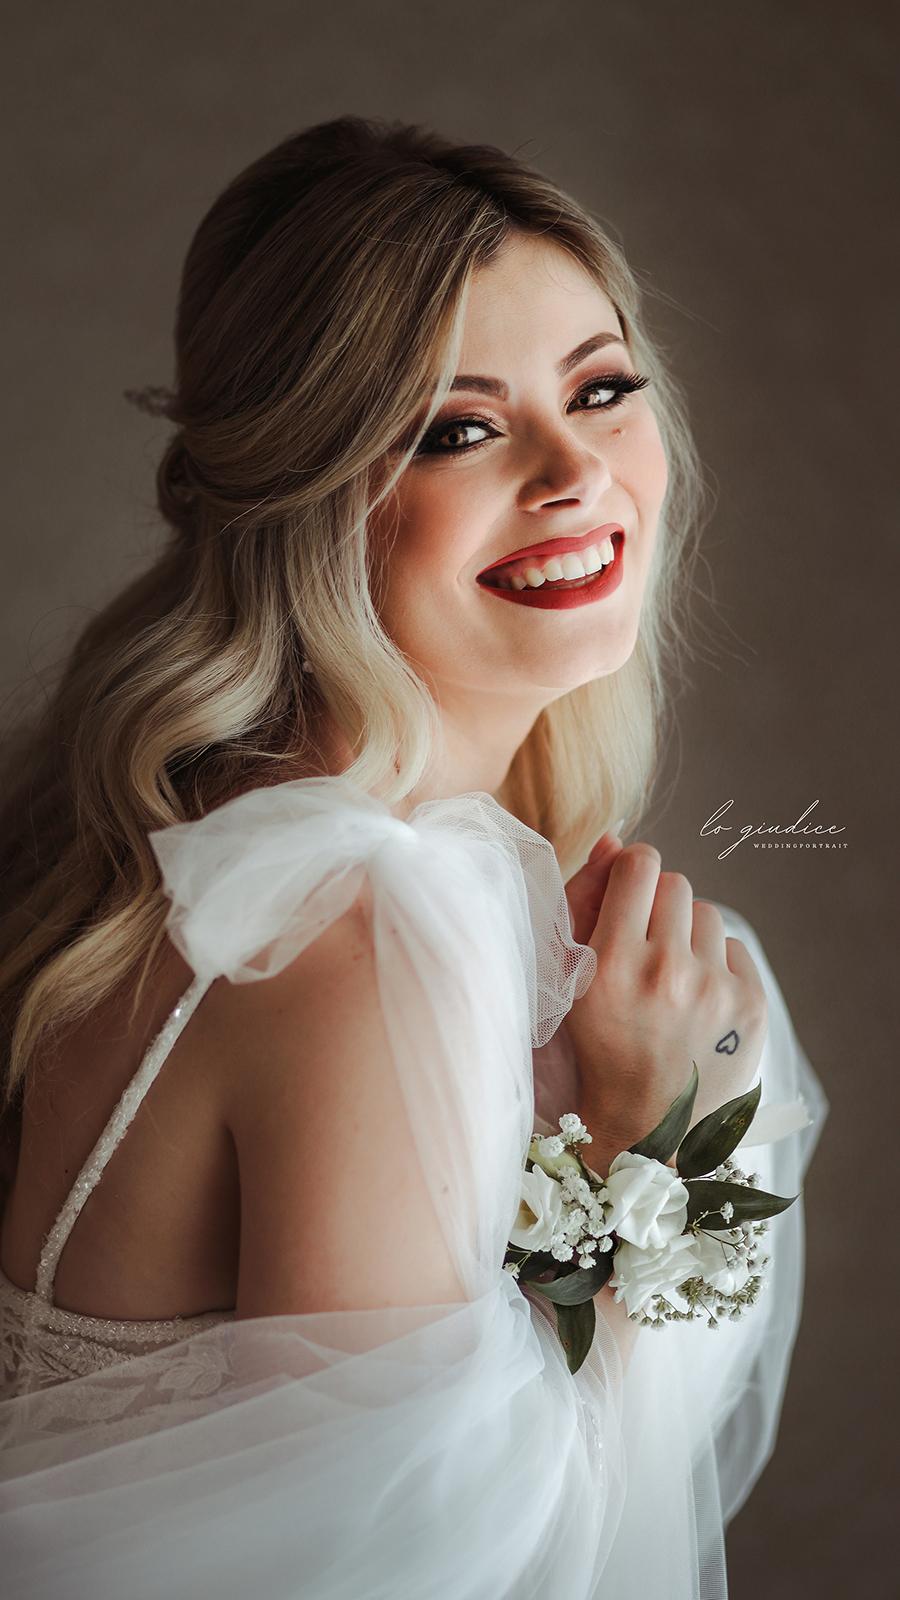 foto sposa sorridente